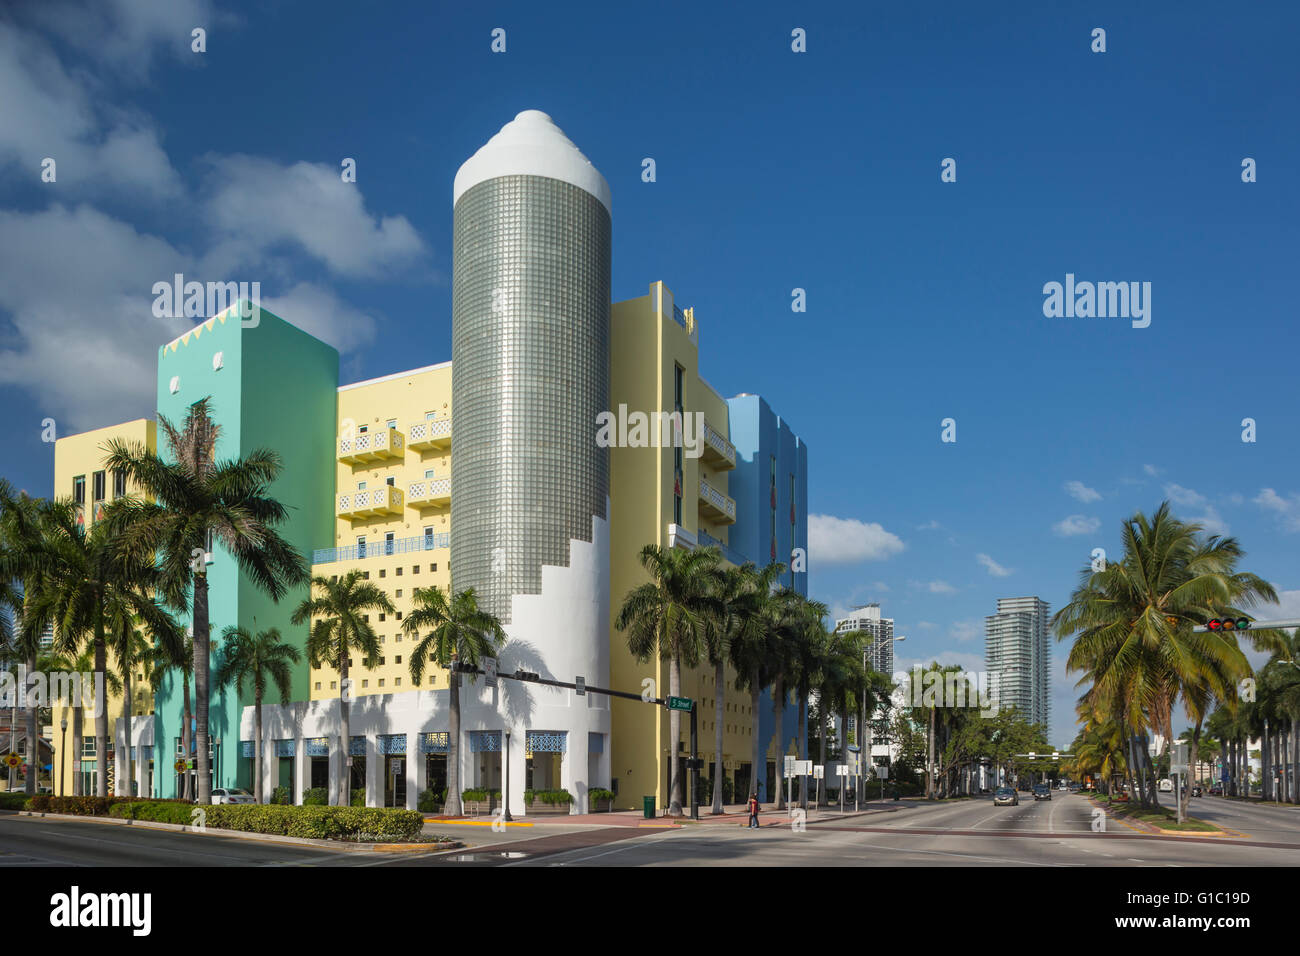 ART DECO STYLE BUILDING 404 WASHINGTON AVENUE SOUTH BEACH MIAMI BEACH FLORIDA USA - Stock Image